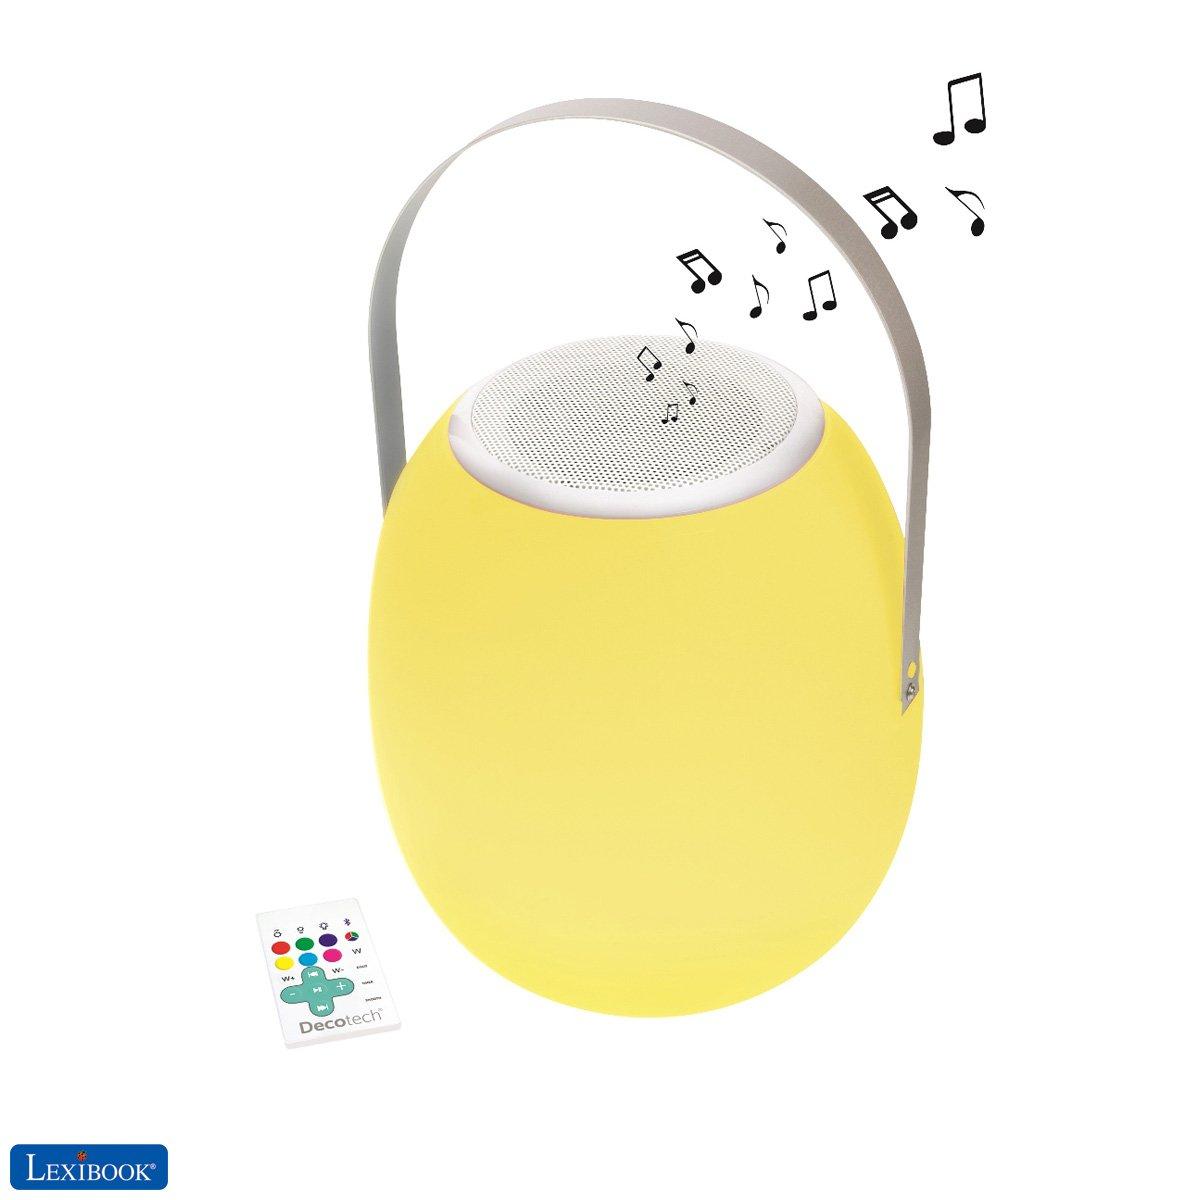 Lexibook - Bluetooth LED Technology Color Waterproof Speaker with handle (BTL710)